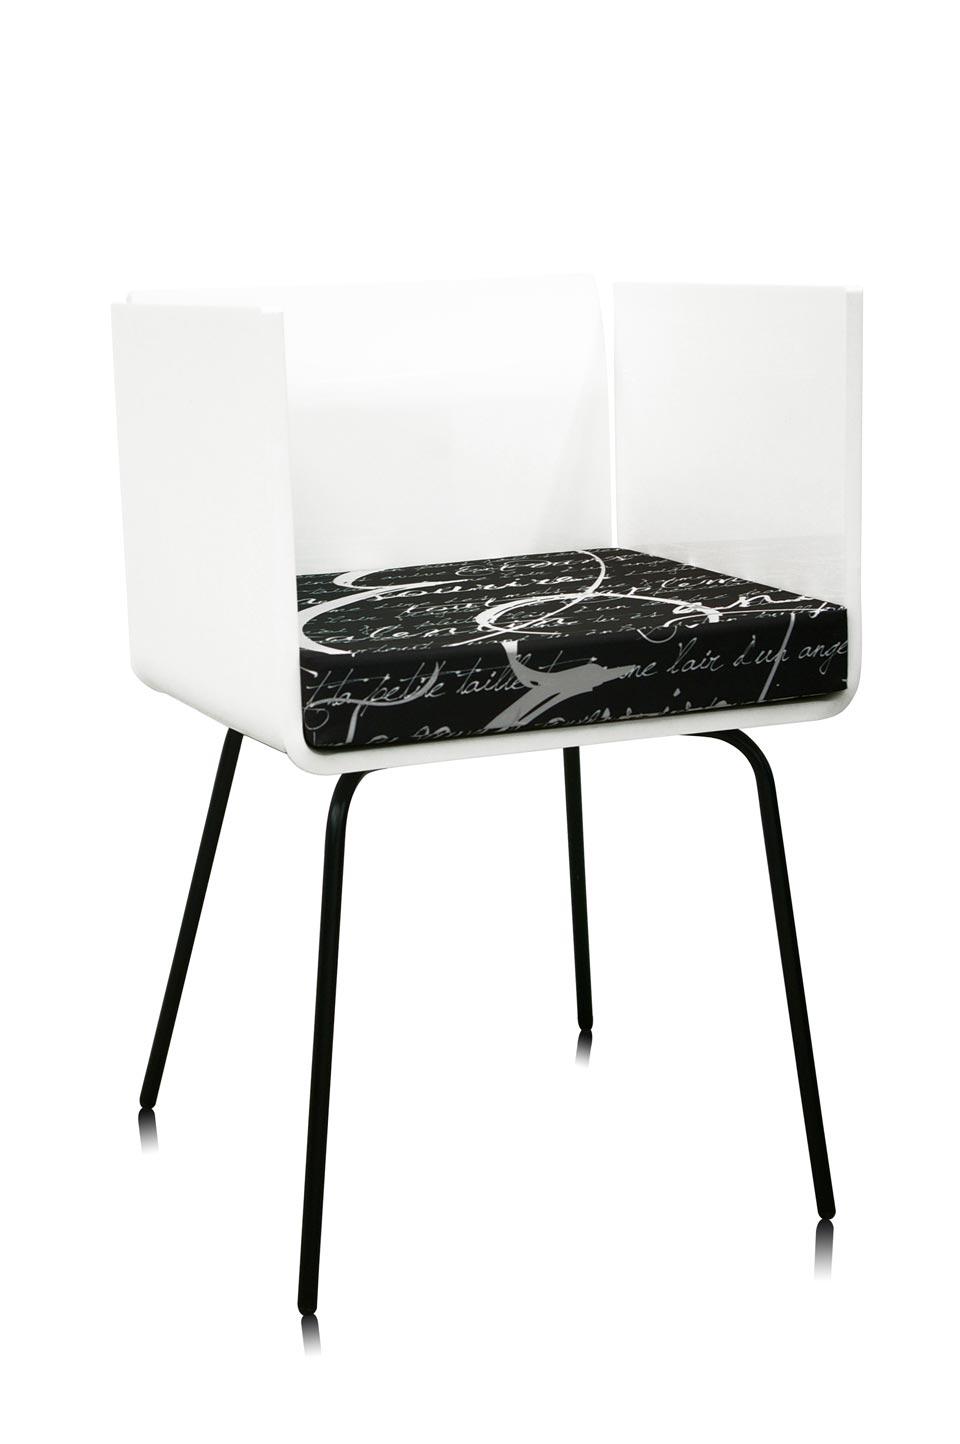 fauteuil cali blanc acrila sp cialiste du plexiglas r f 15090210. Black Bedroom Furniture Sets. Home Design Ideas